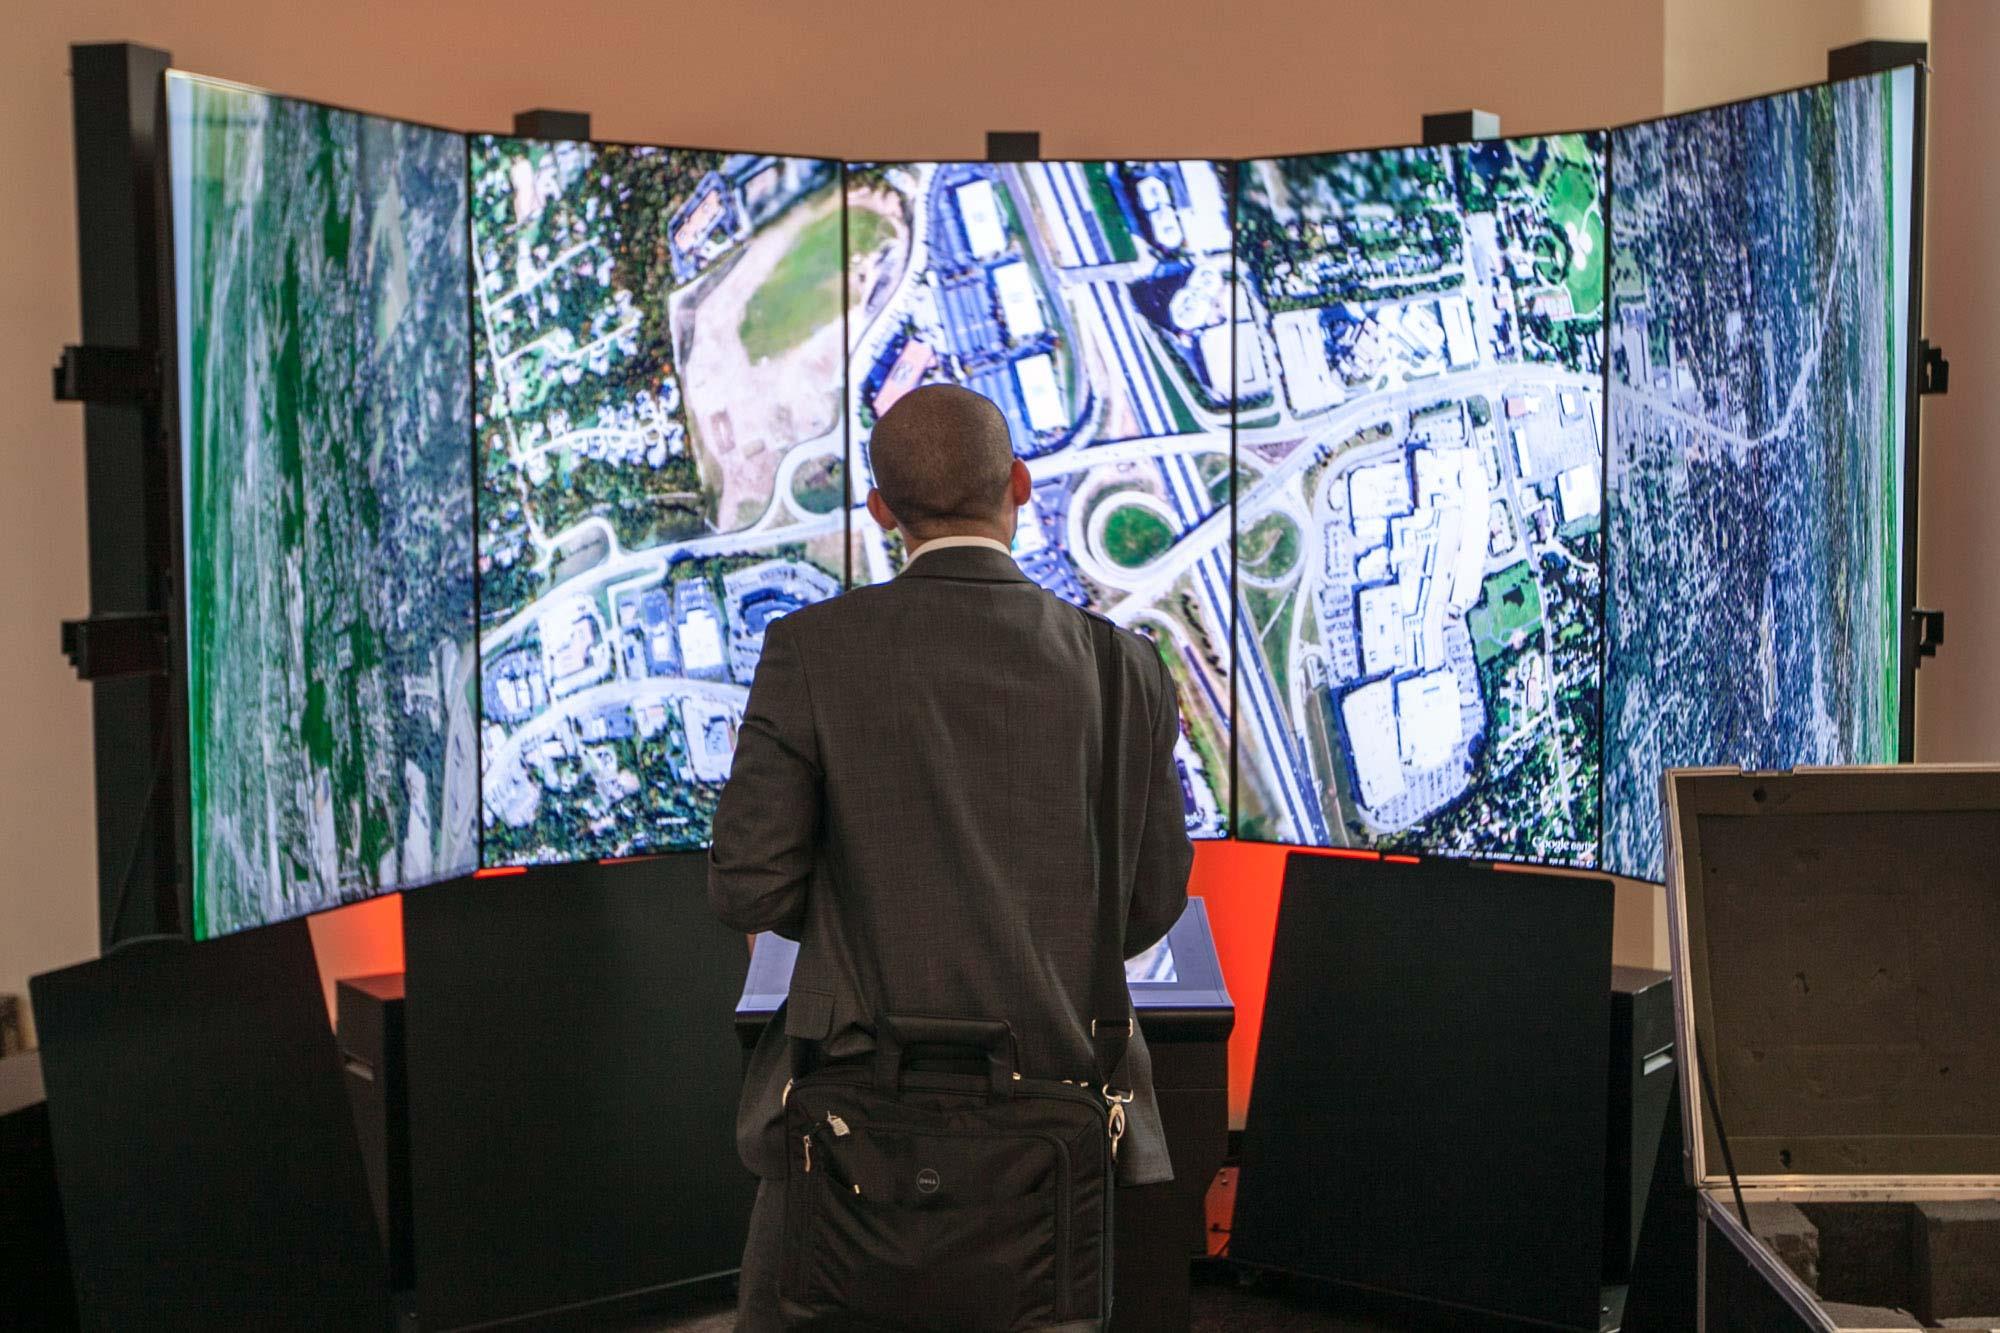 Google Earth immersion at Startup Grind 2014